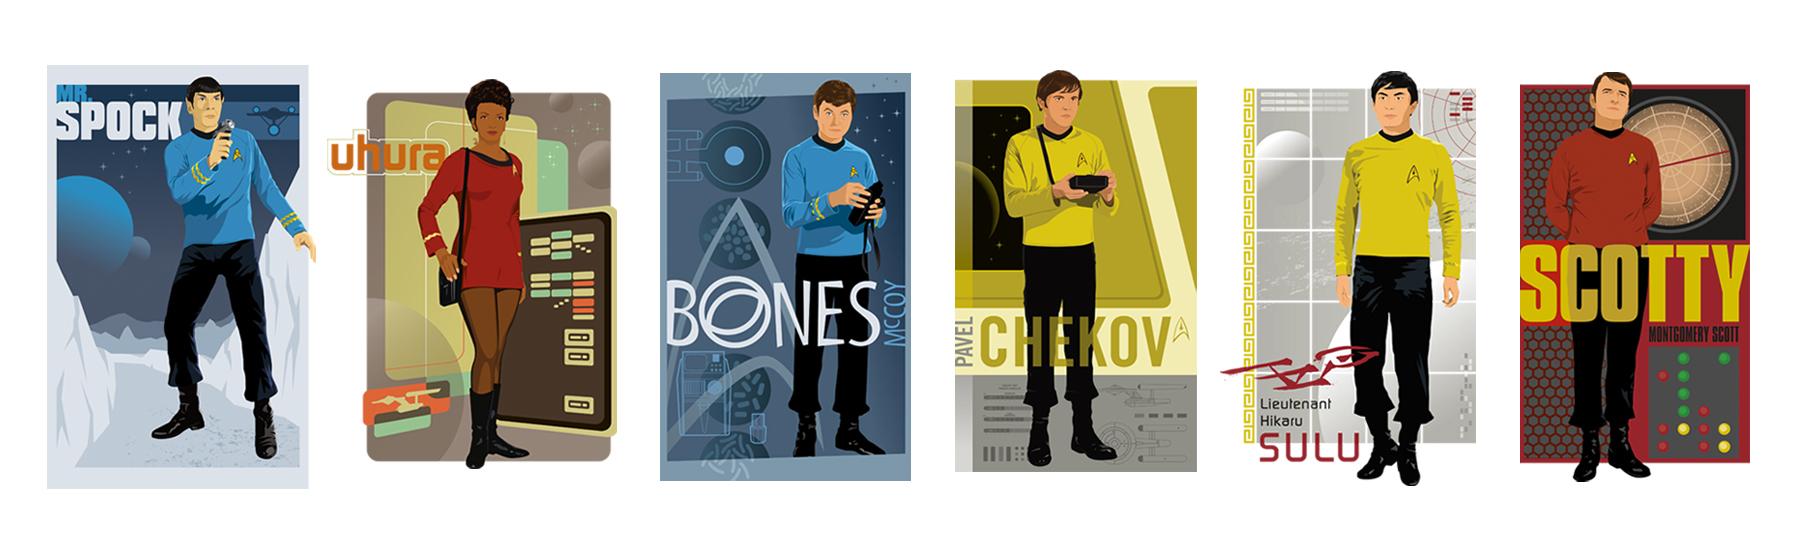 Star Trek Universe Style Guide Design - ID 3